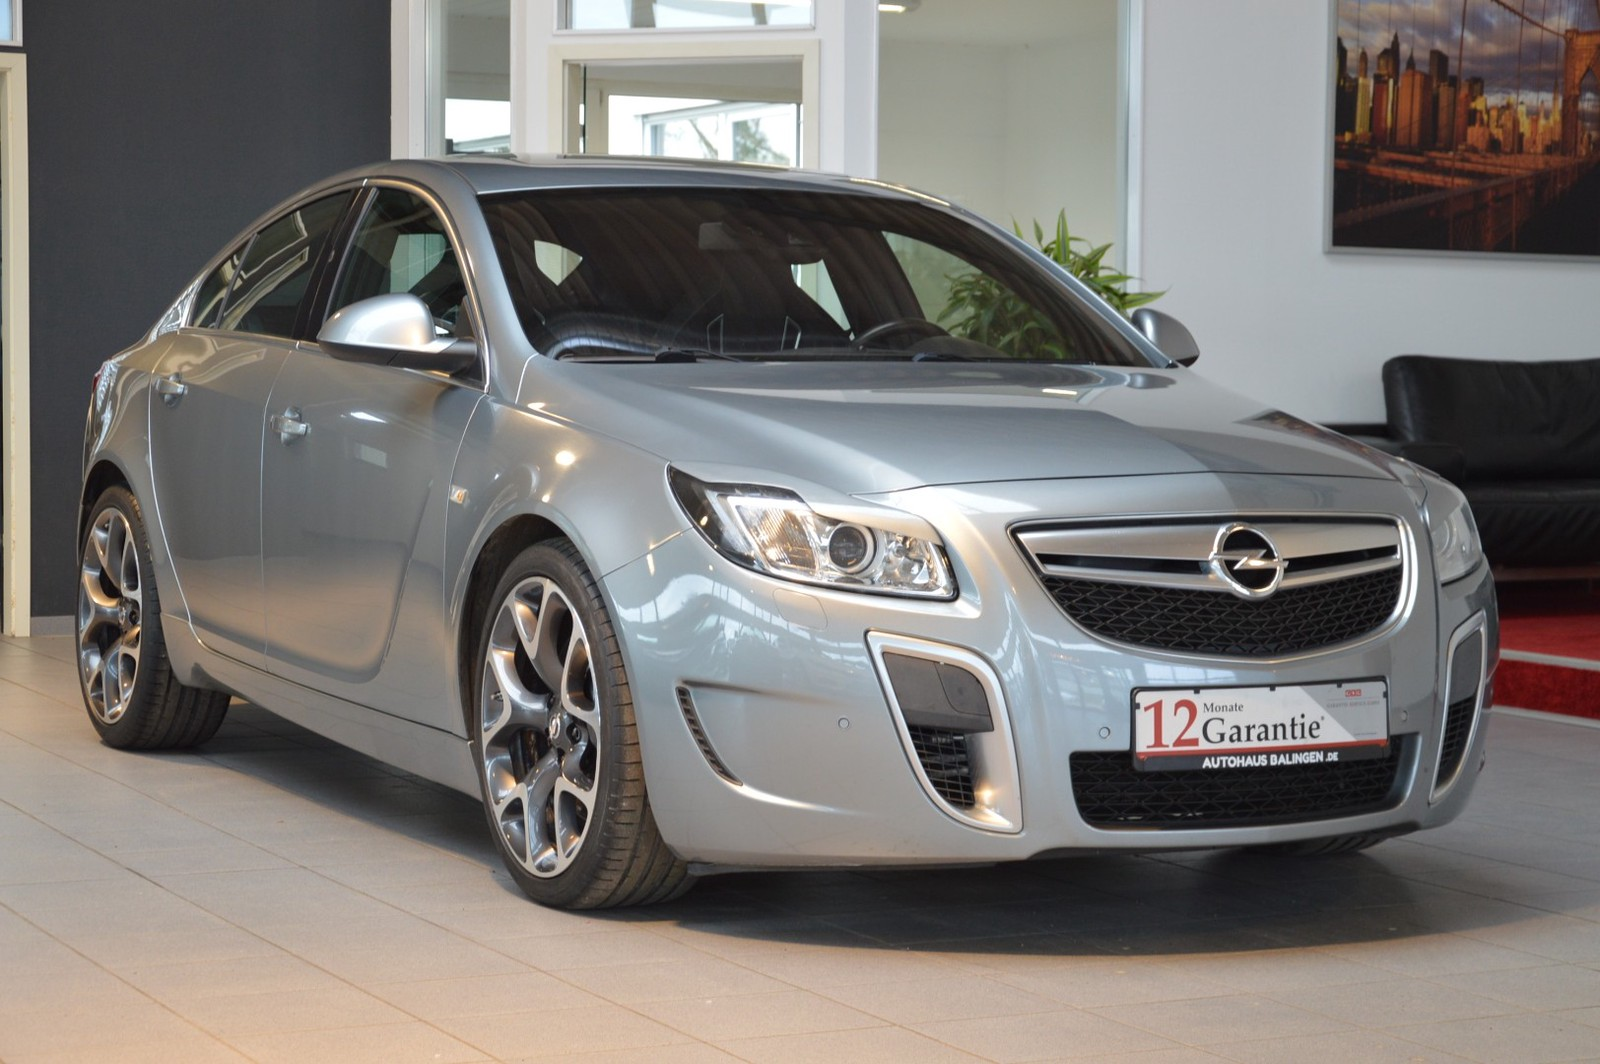 Opel Insignia Opc 2 8 V6t 4x4 Gebraucht Kaufen In Balingen Preis 12990 Eur Int Nr 1354 Verkauft